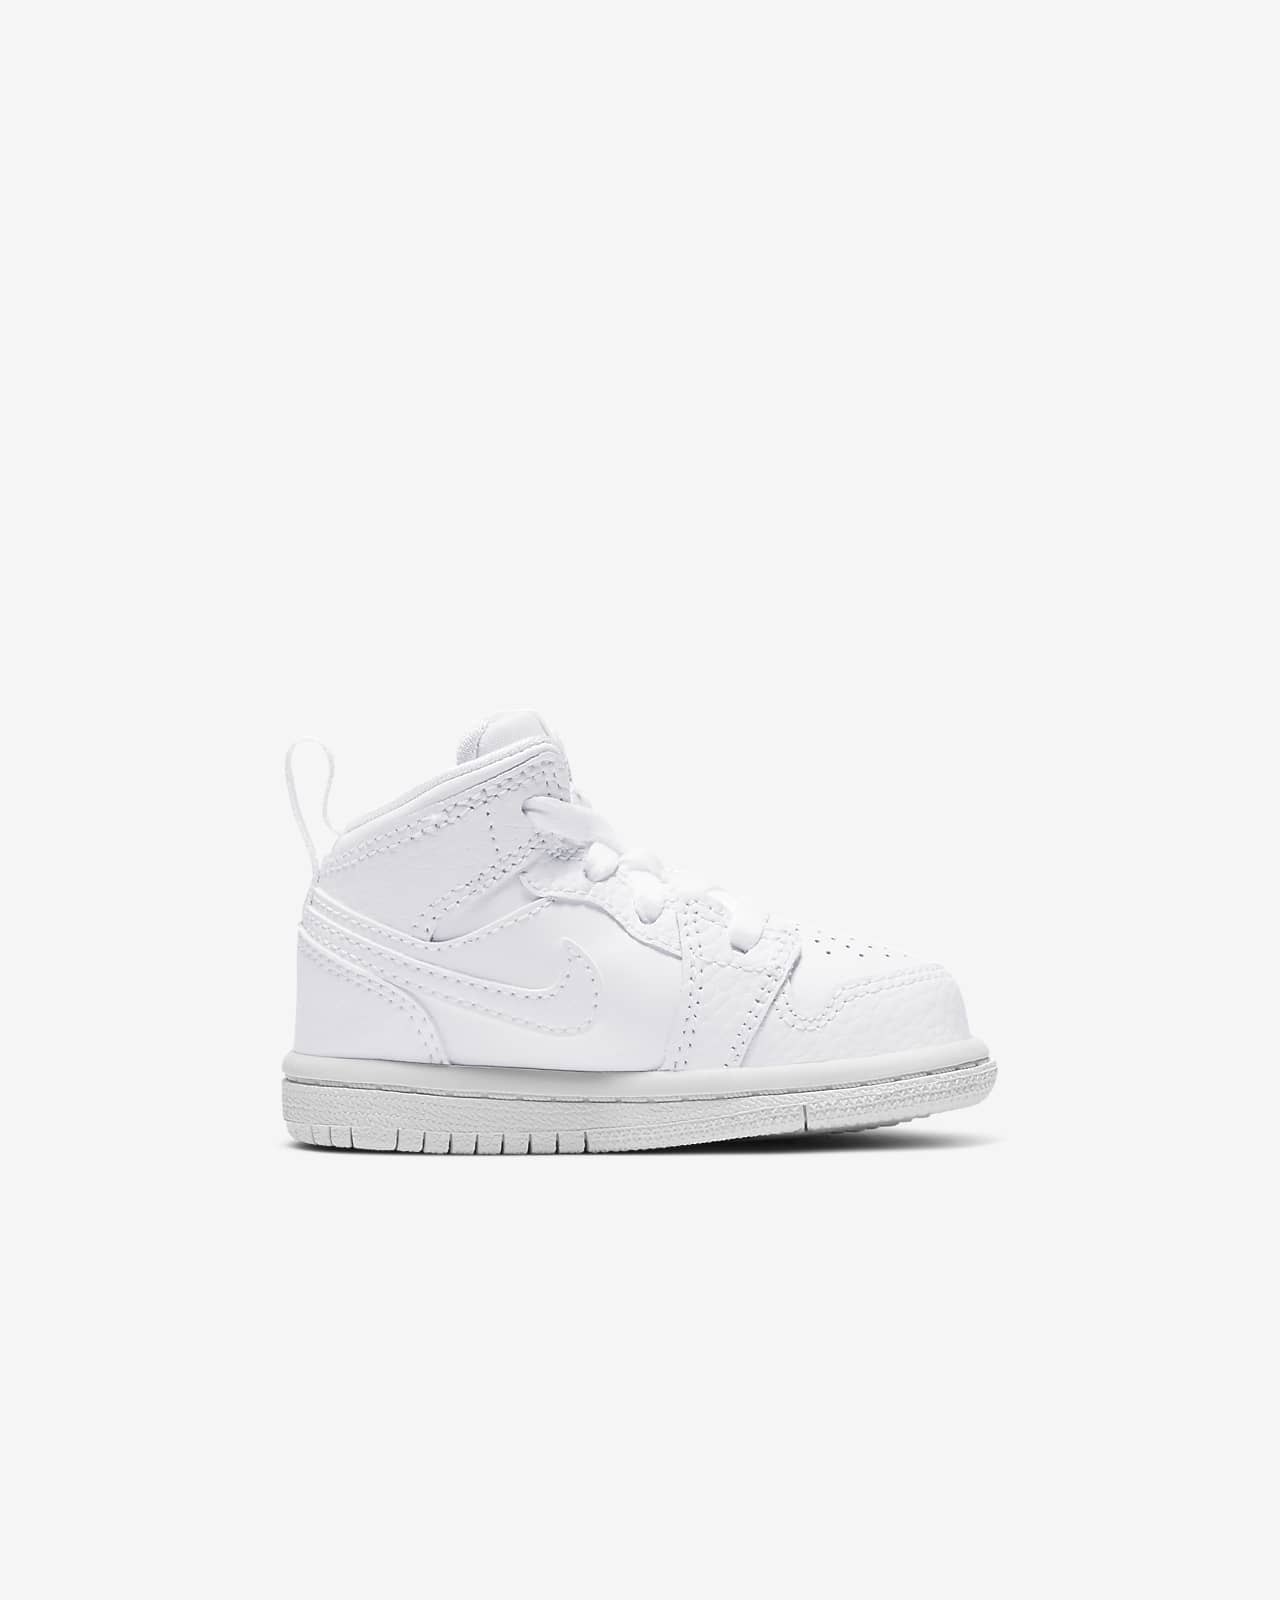 Jordan 1 Mid Baby and Toddler Shoe. Nike MA